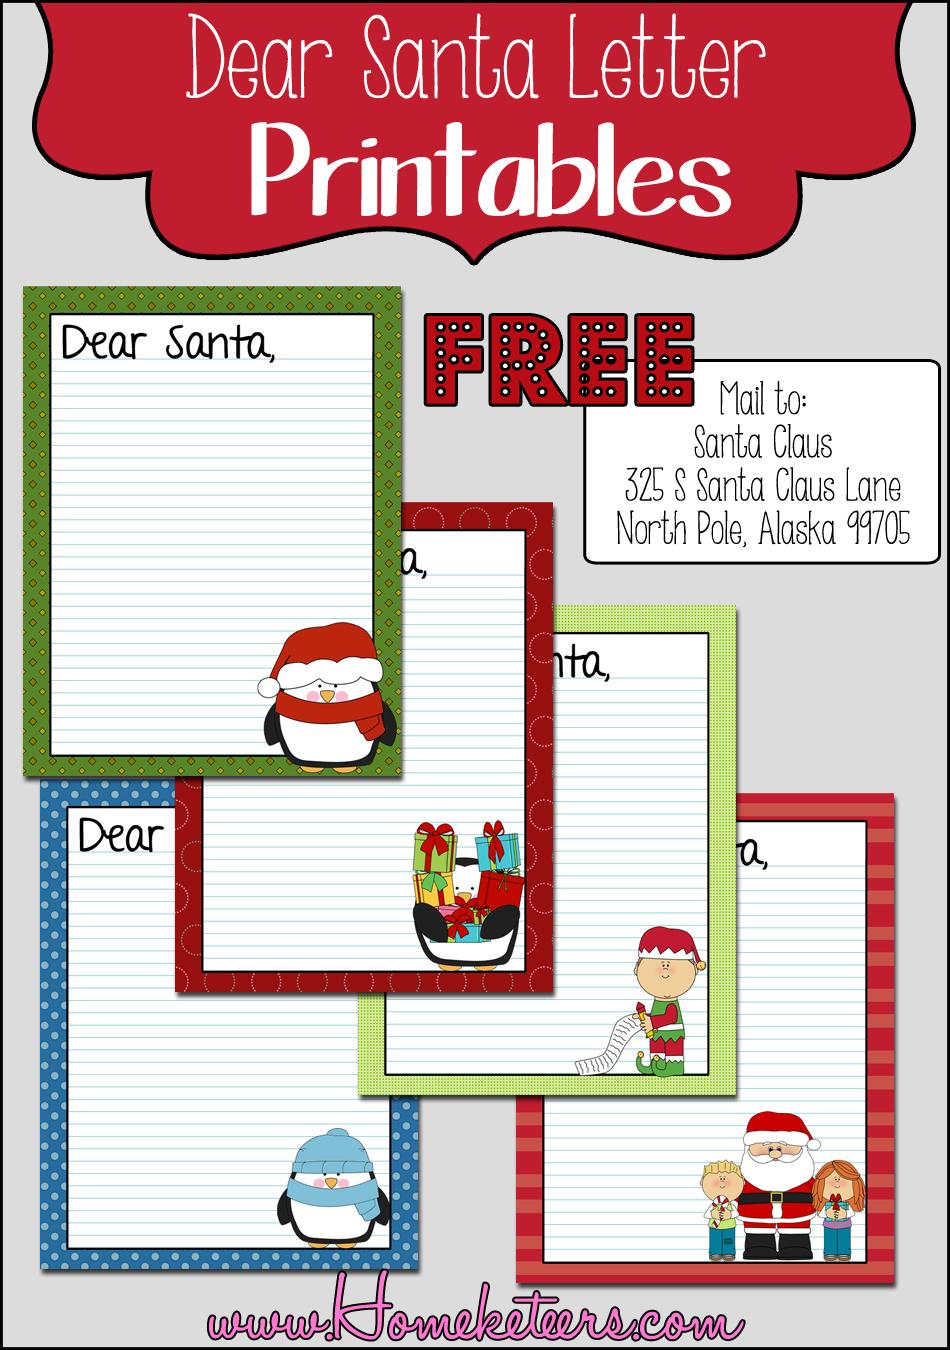 Dear Santa Letter FREE Printable Free printable santa